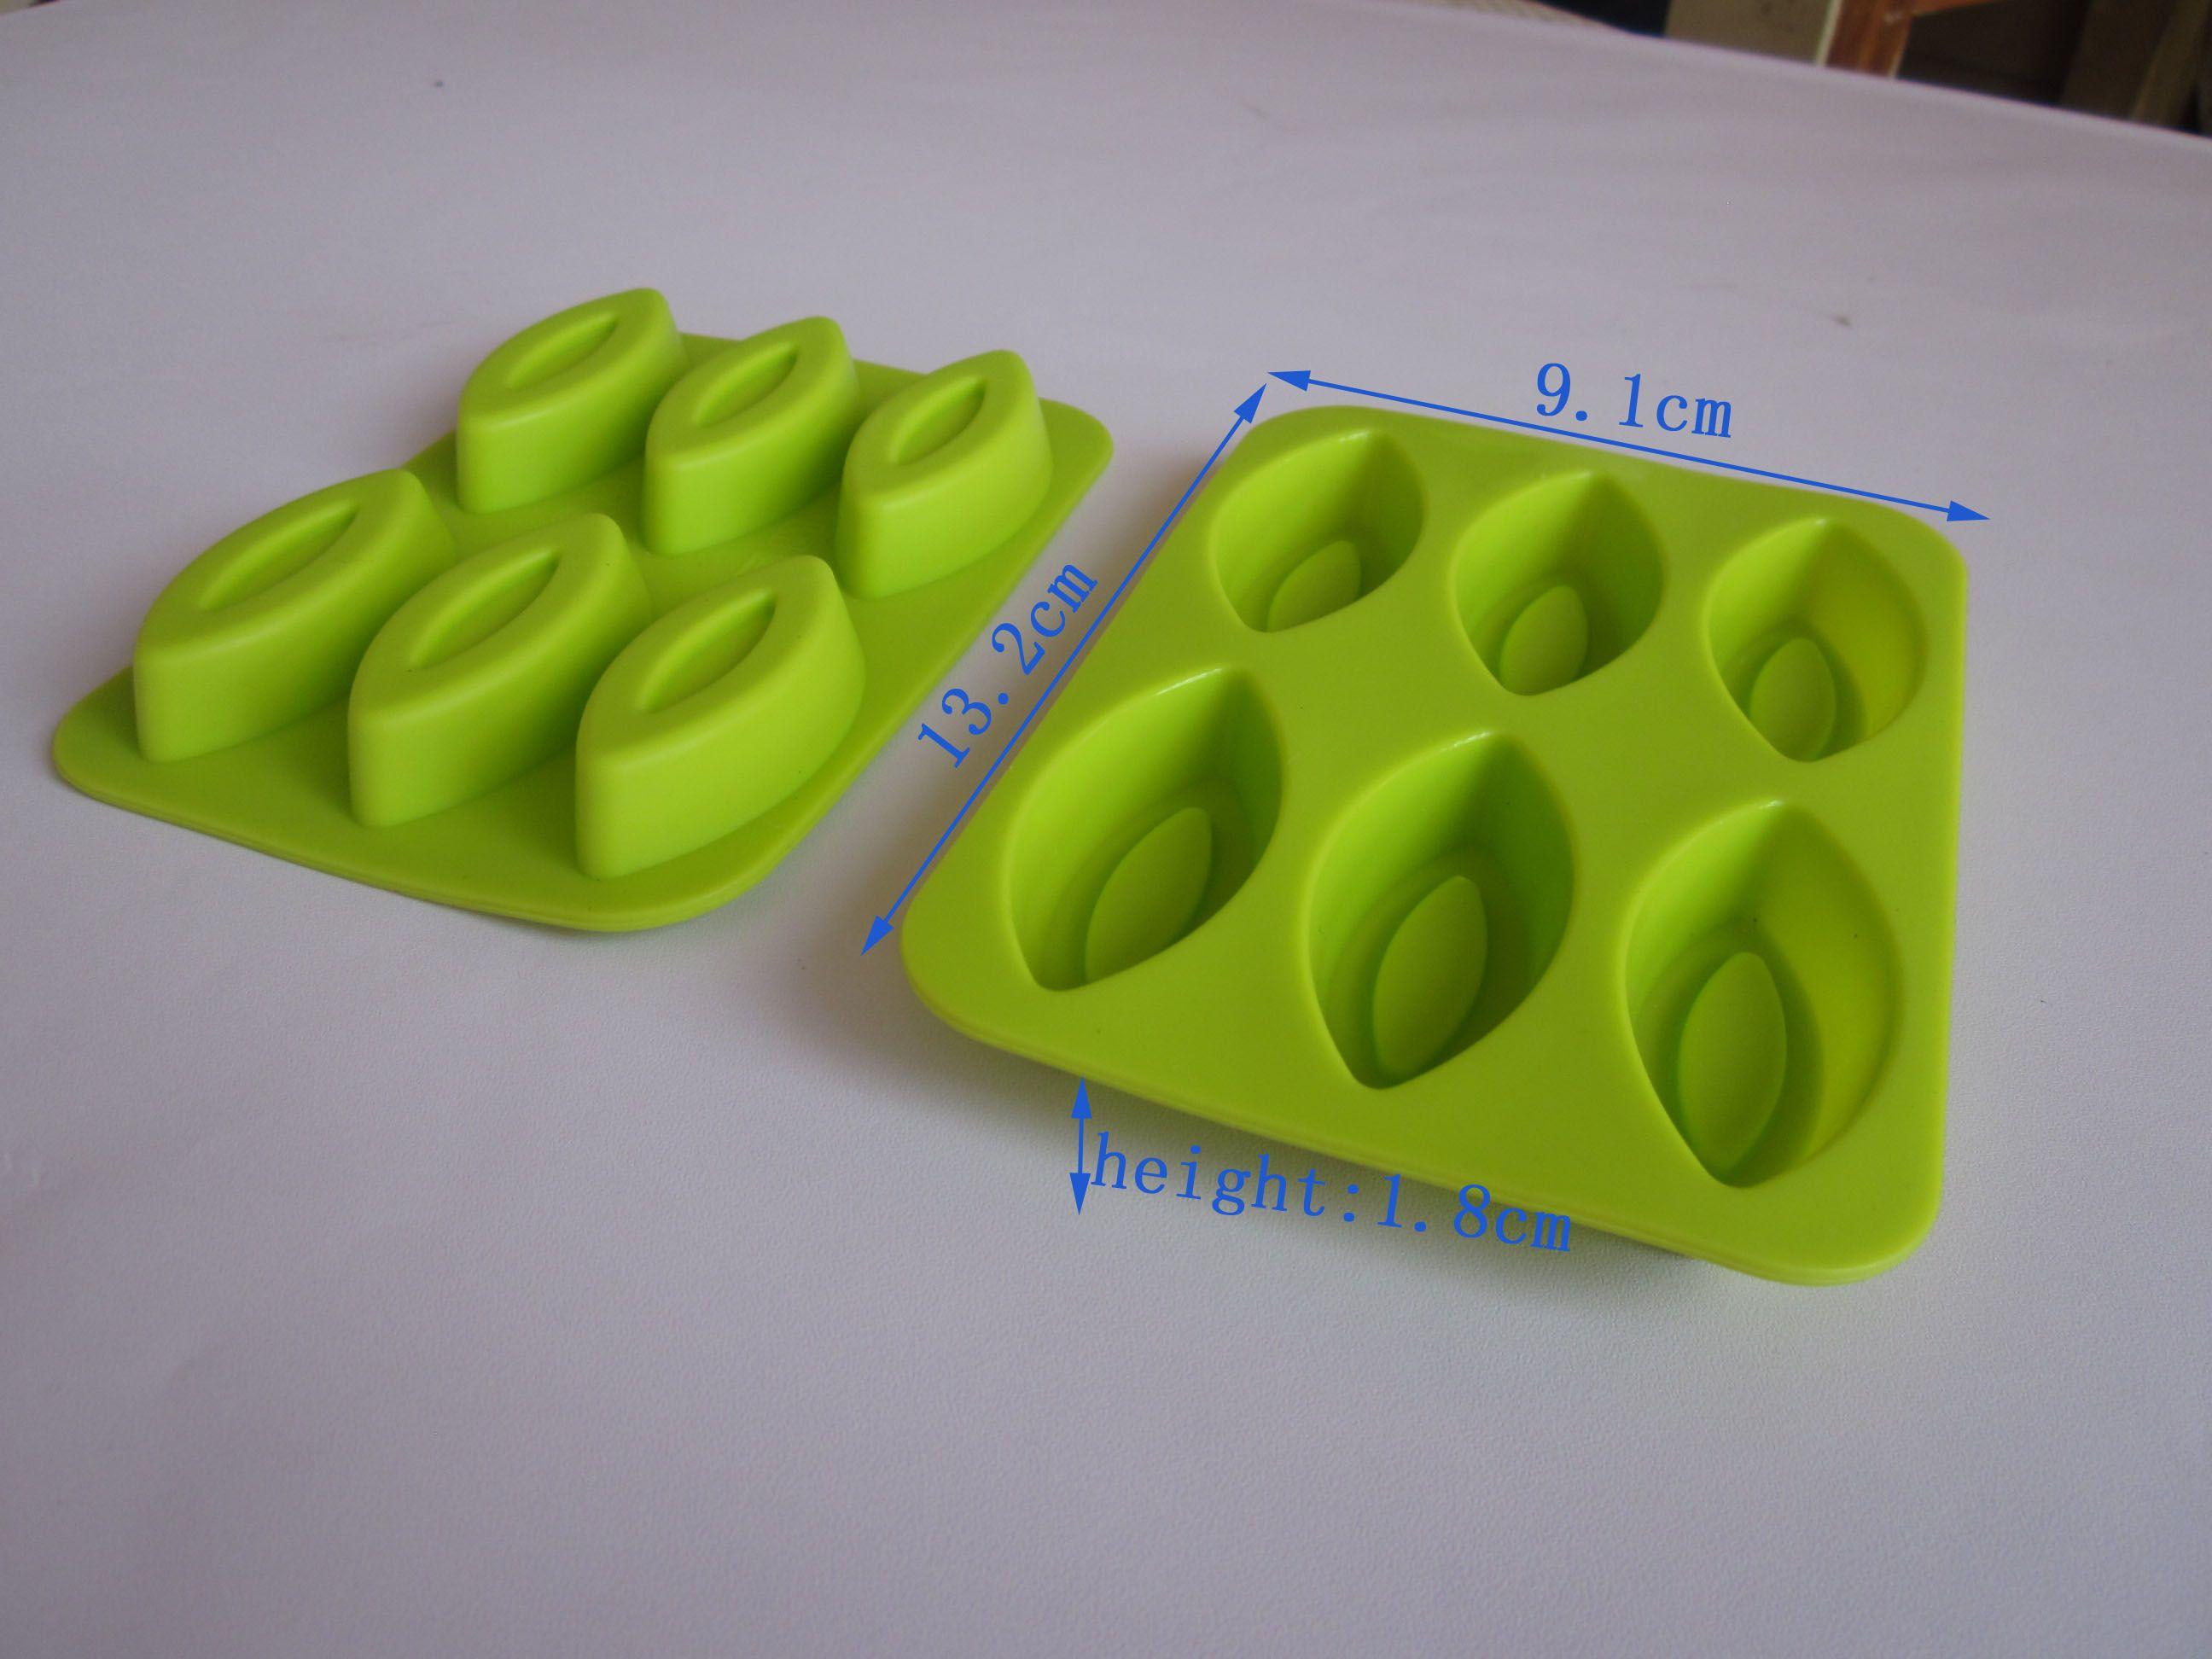 10 st / parti 100% silikongummi silikonkaka mögel / silikon choklad mögel / spirande mögel / gelé mögel / tårta verktyg / matlagningsverktyg + gratis frakt